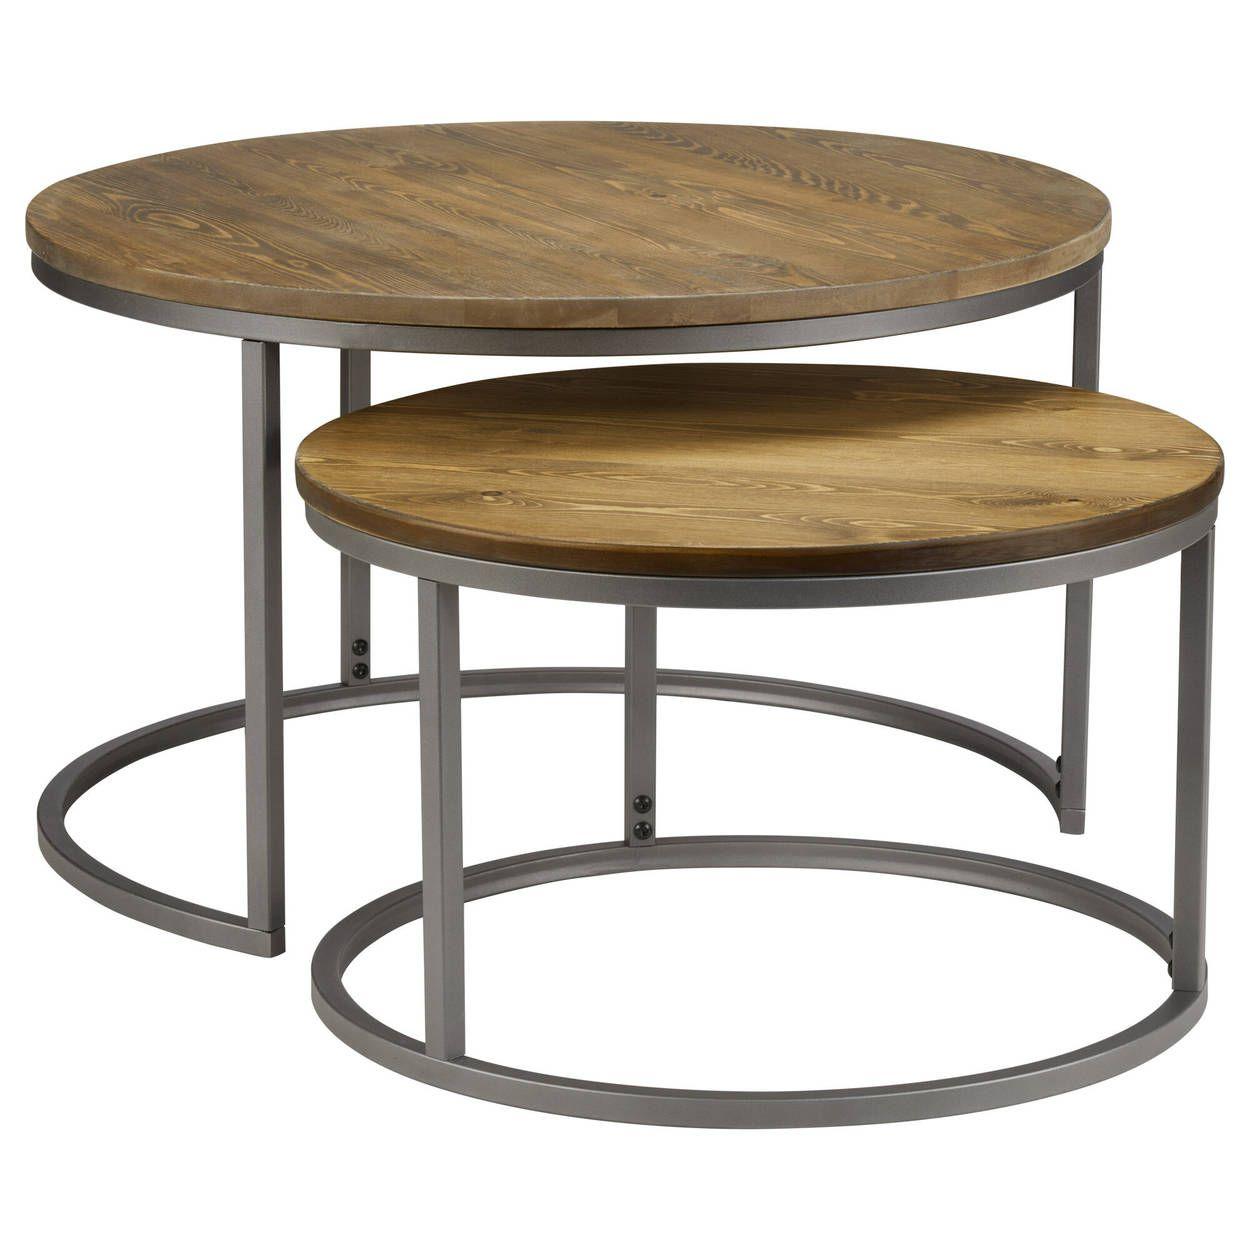 Set Of 2 Pine Wood Coffee Tables With Metal Legs Coffee Table Wood Coffee Table Metal Coffee Table [ 1250 x 1250 Pixel ]